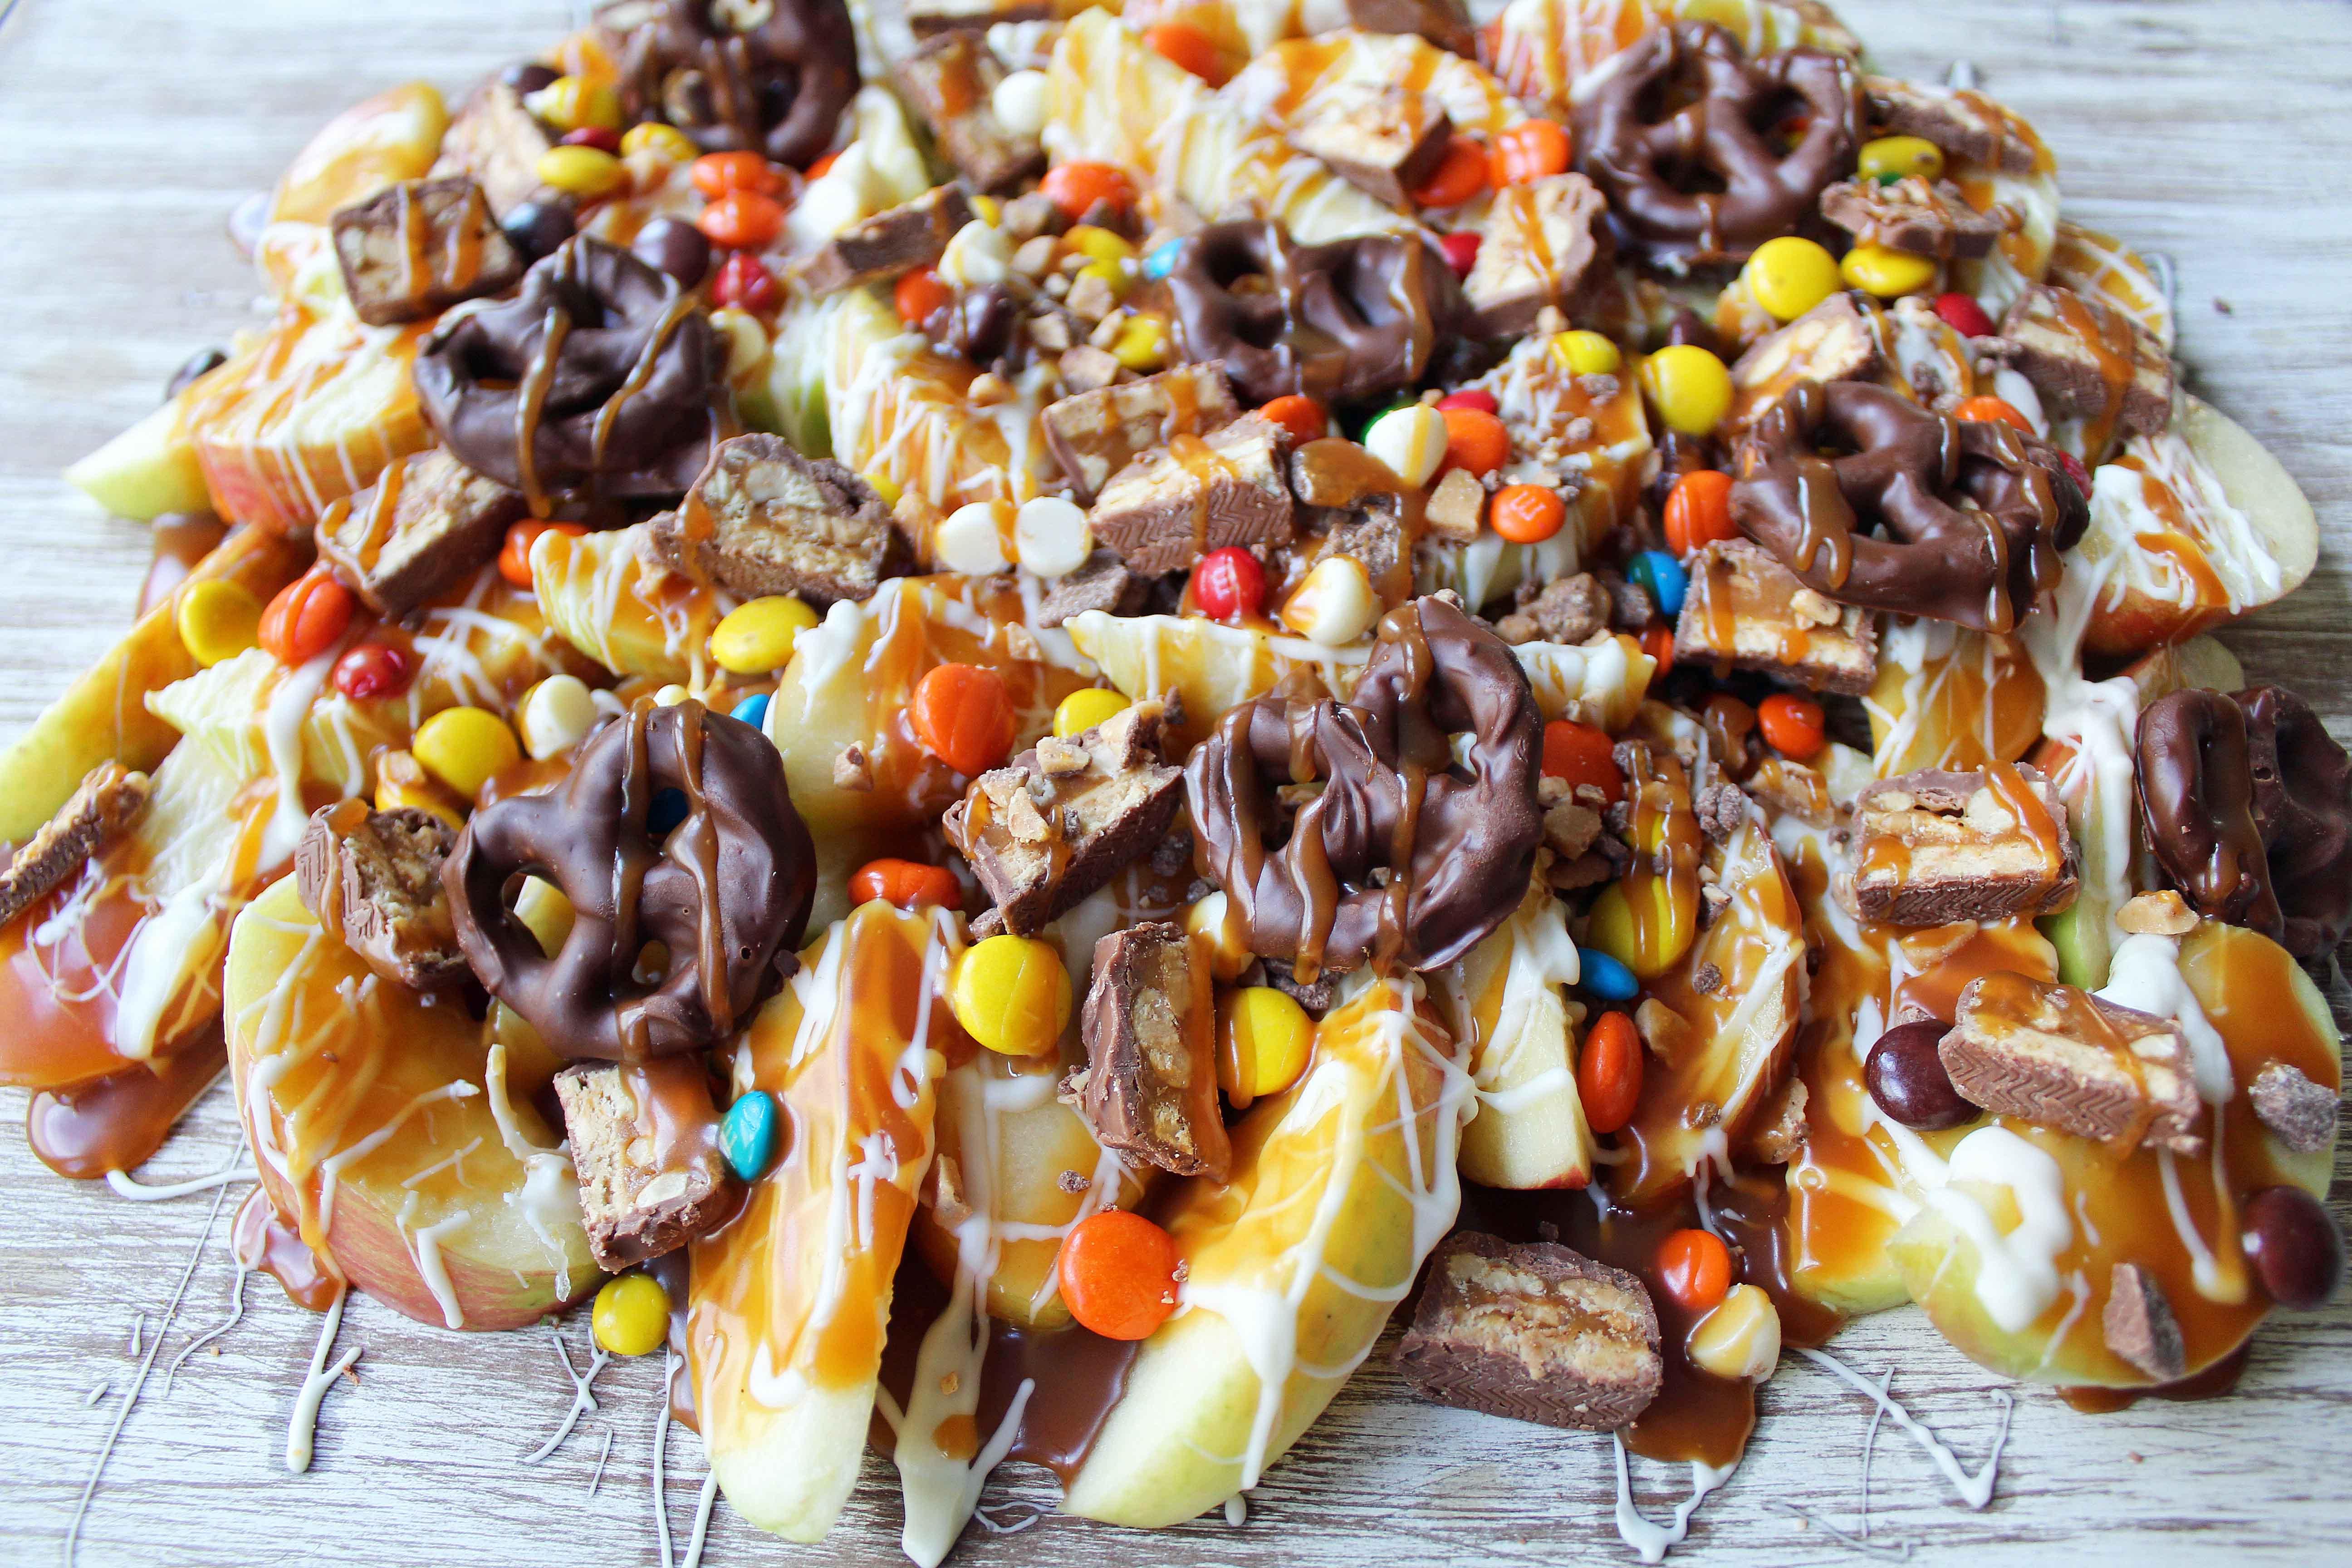 Chocolate Covered Pretzels Orange County